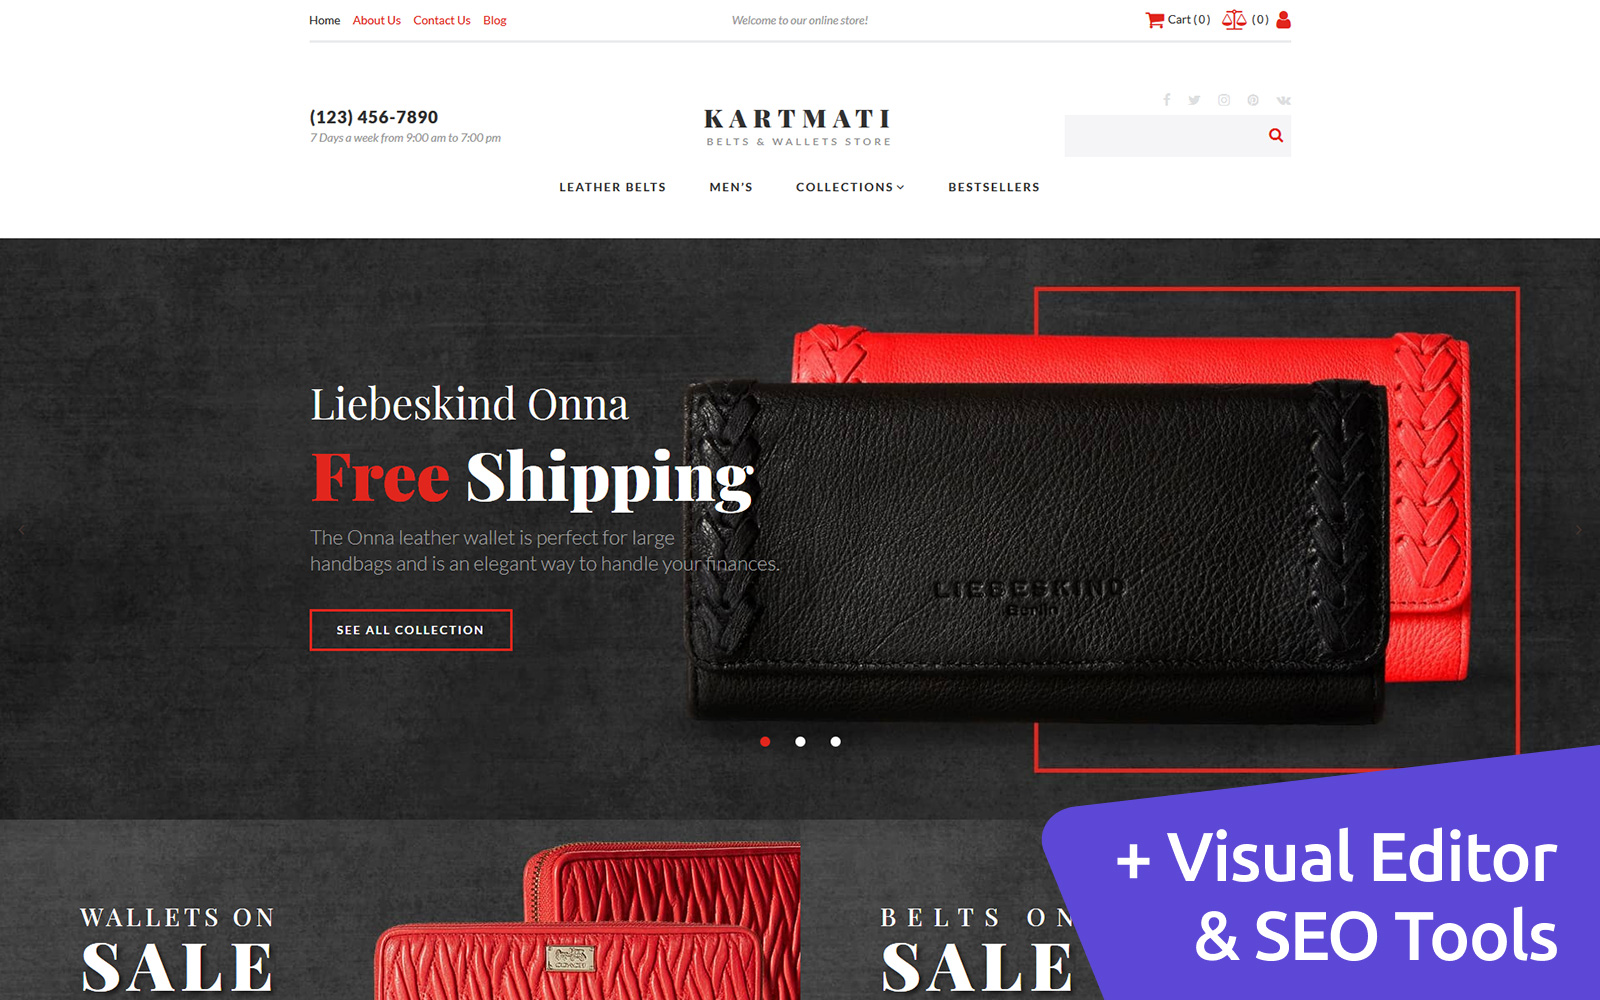 Kartmati - Leather Goods & Accessories MotoCMS Ecommerce Template